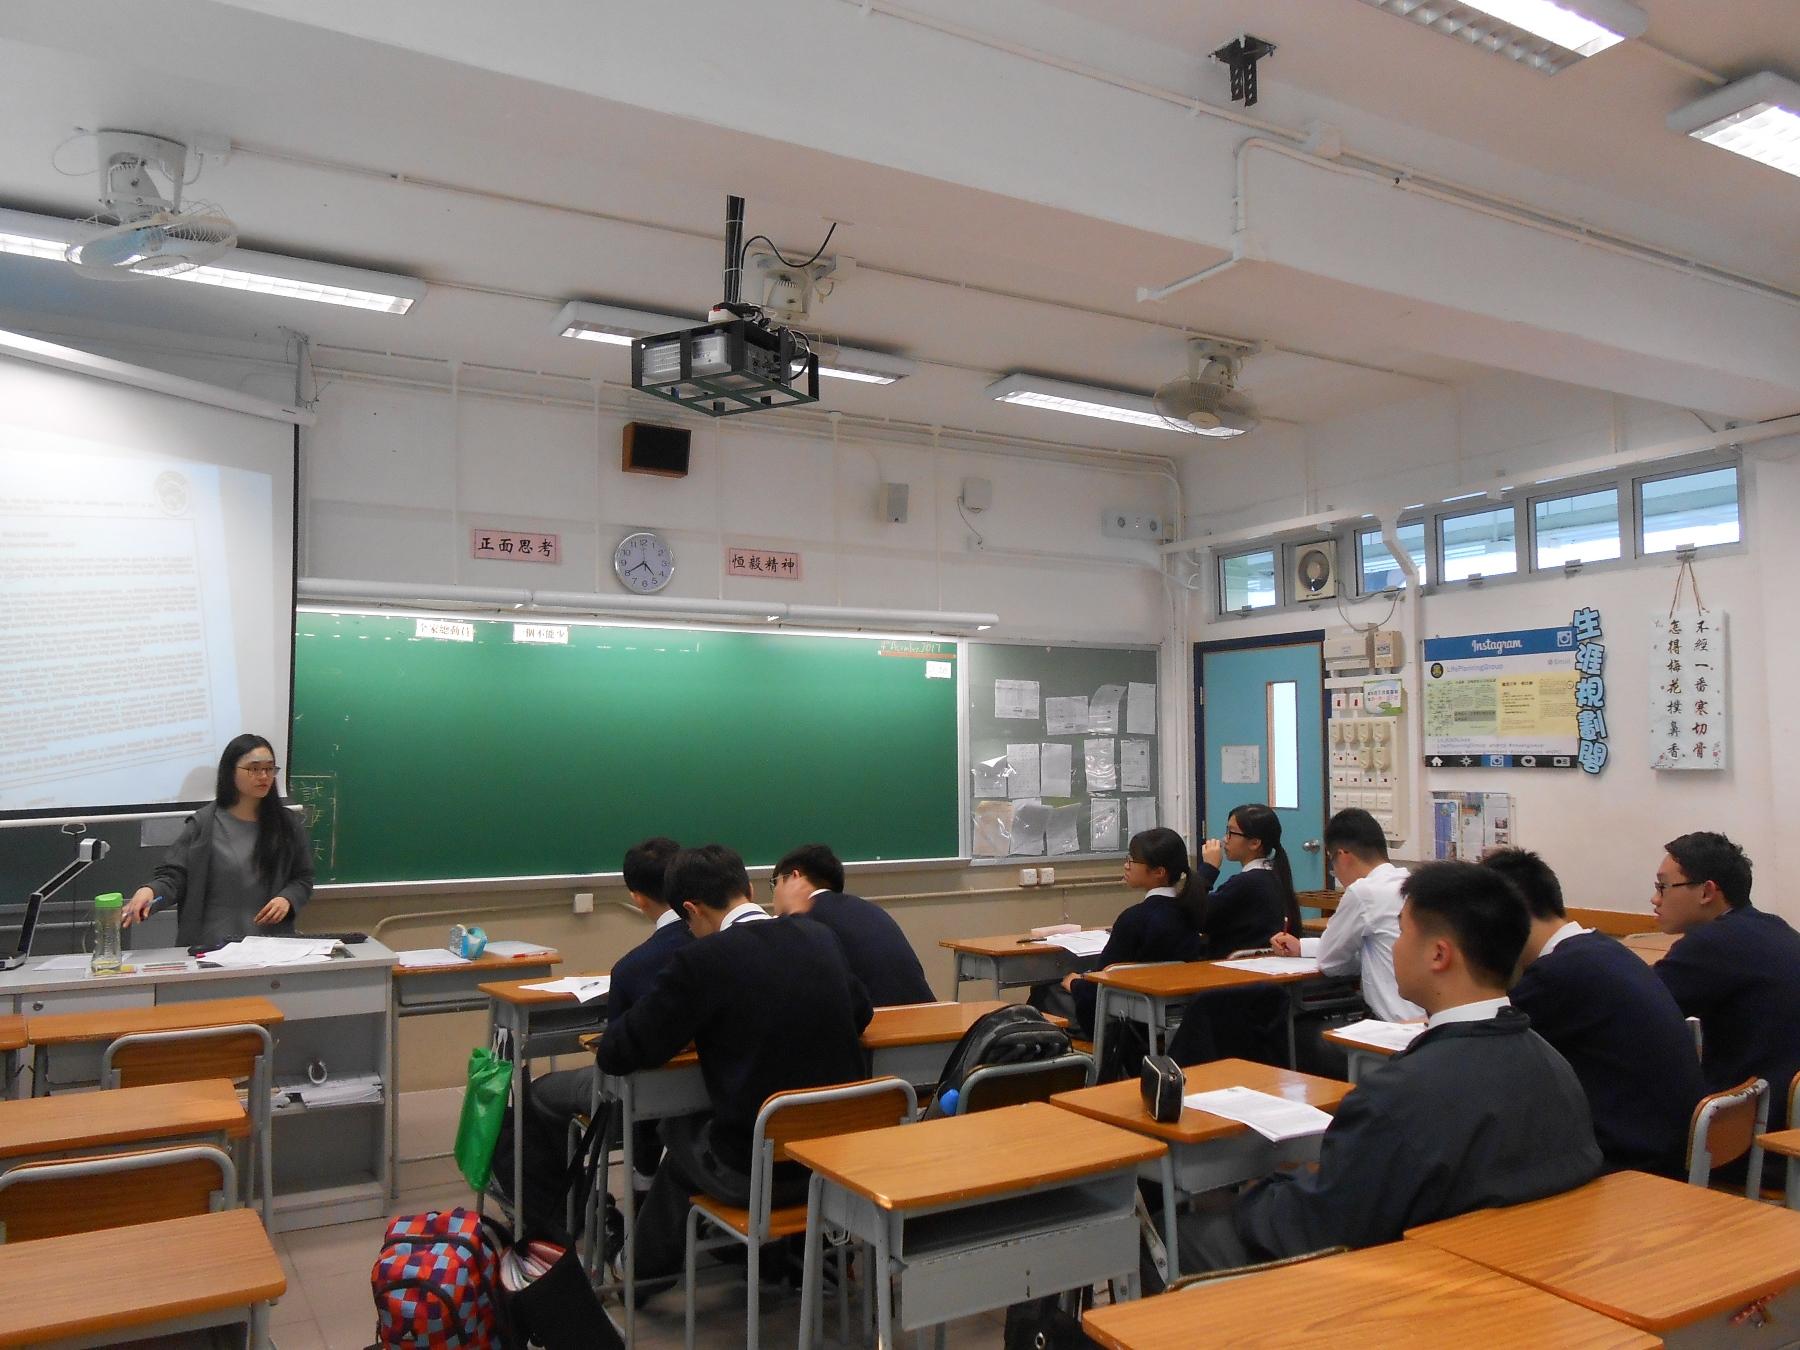 http://www.npc.edu.hk/sites/default/files/dscn9248.jpg